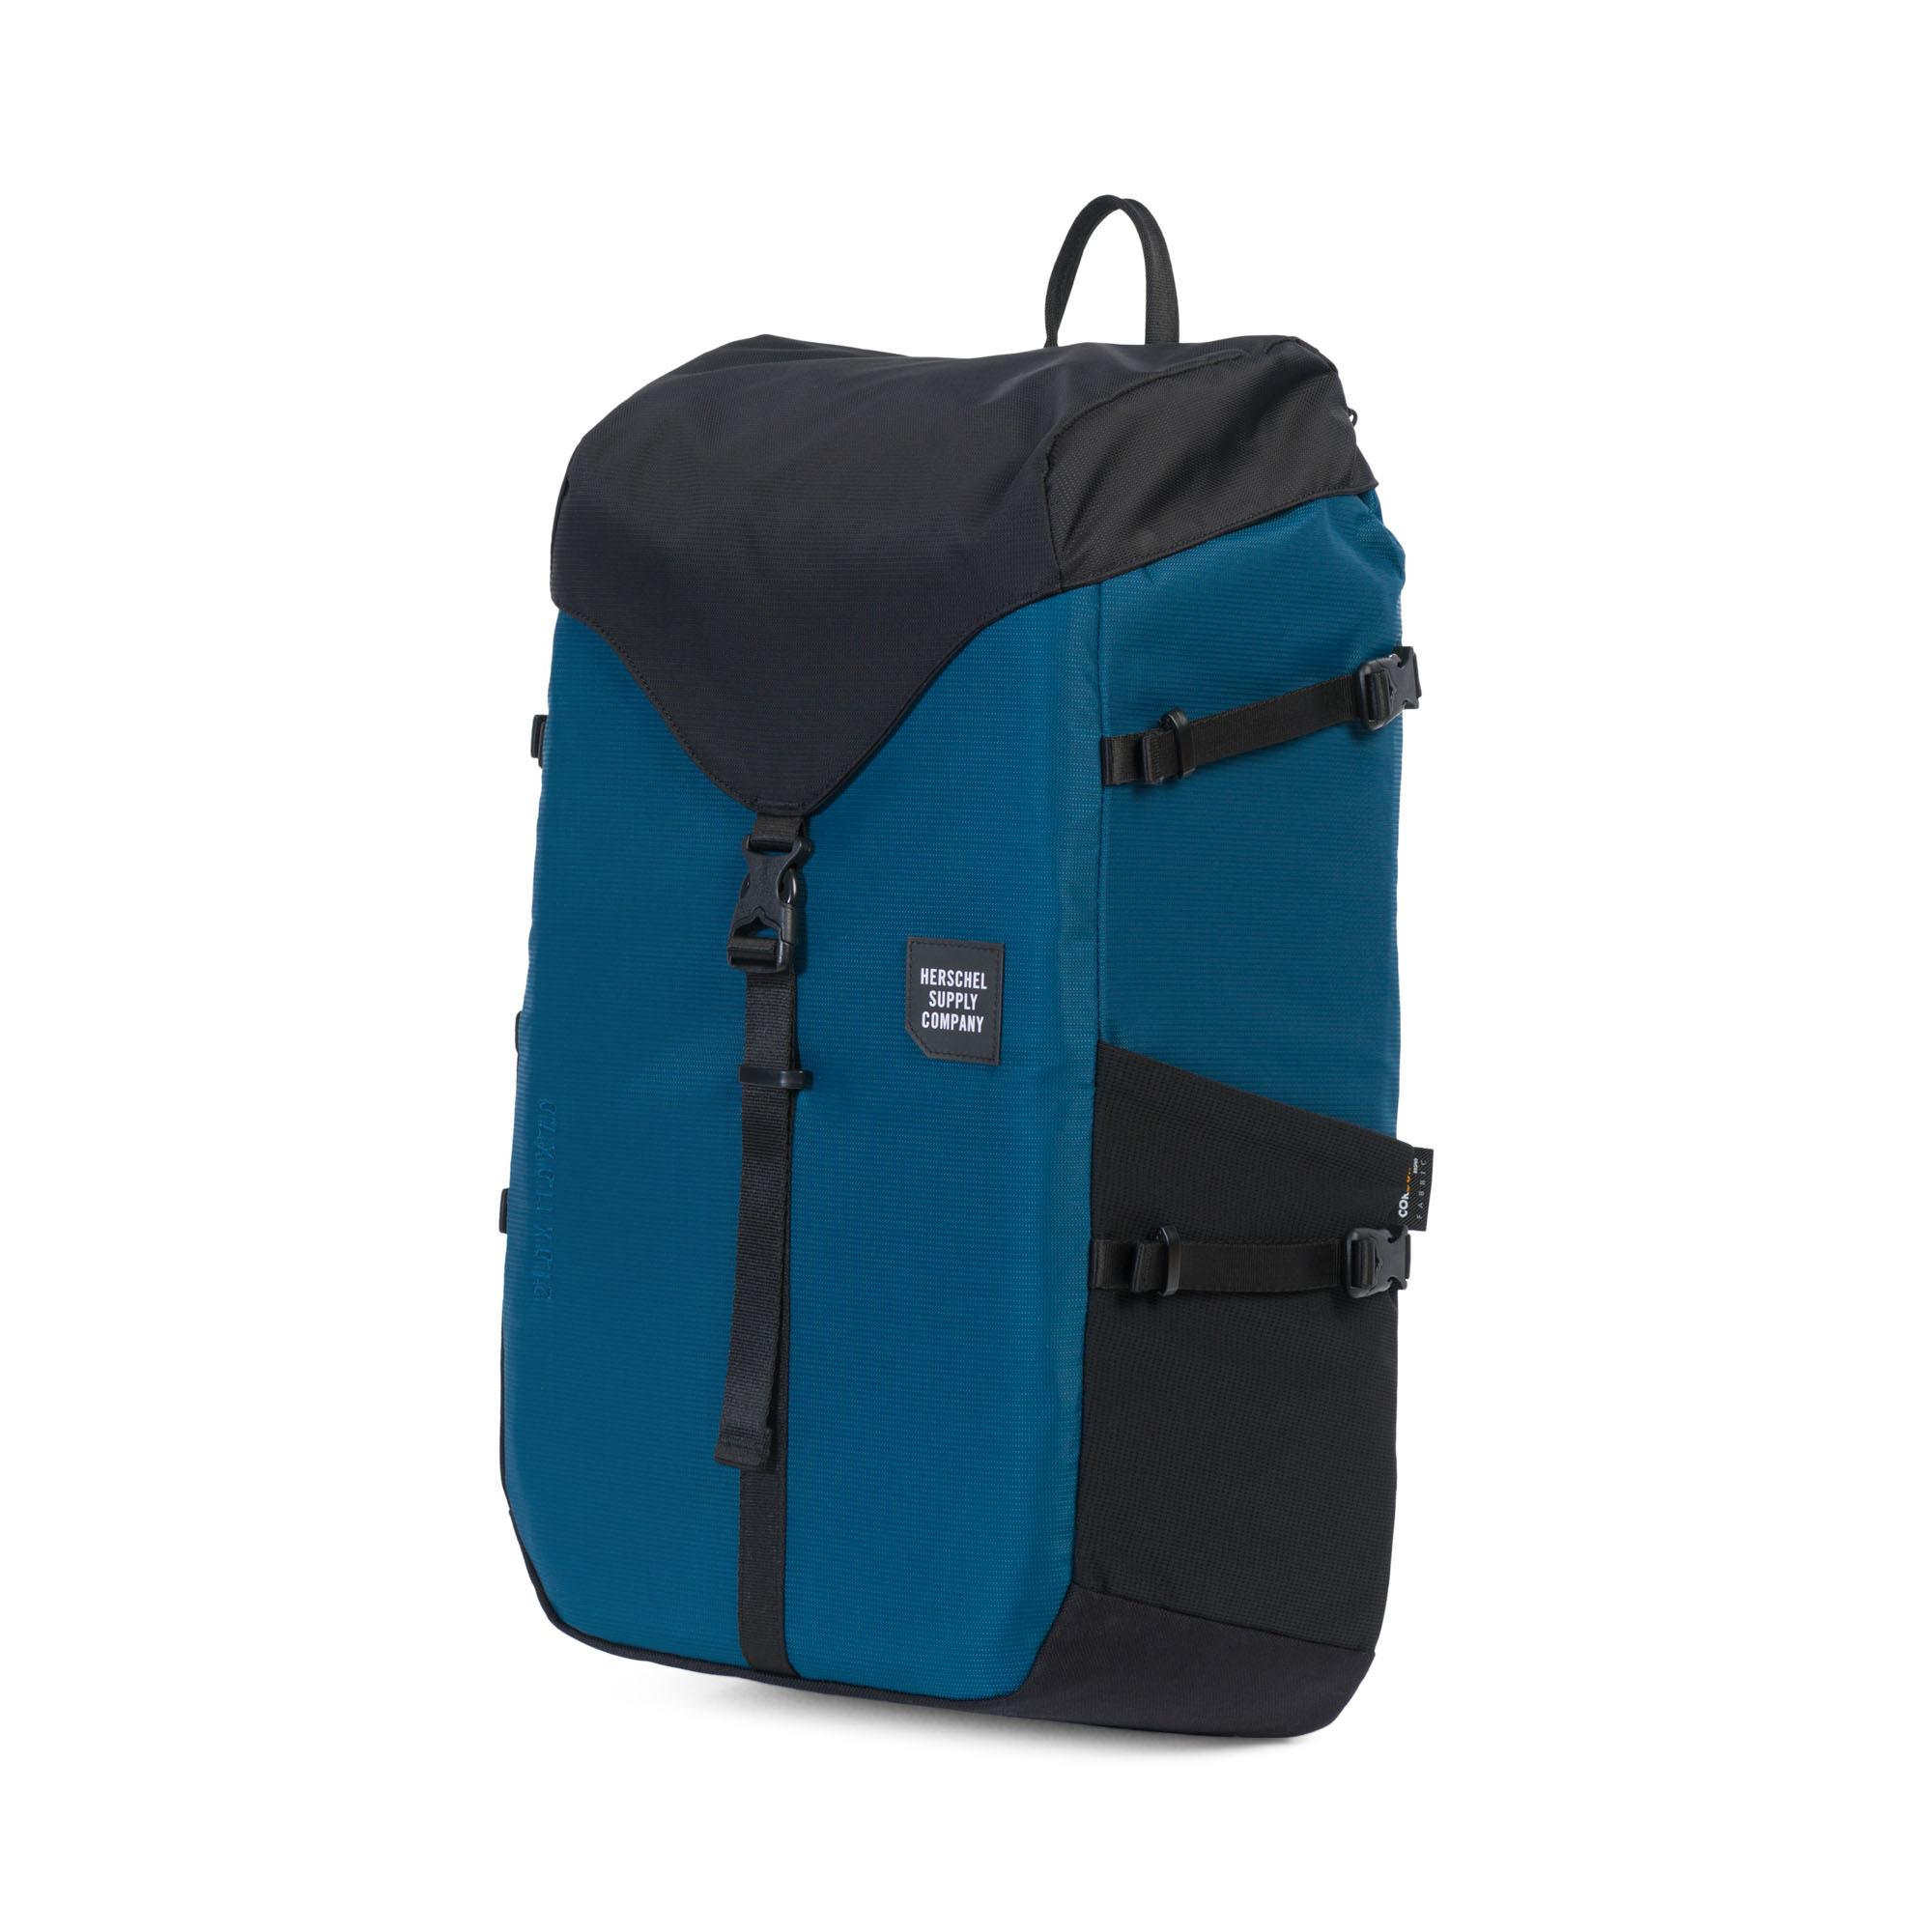 2827d9a7e1 Barlow Backpack Large